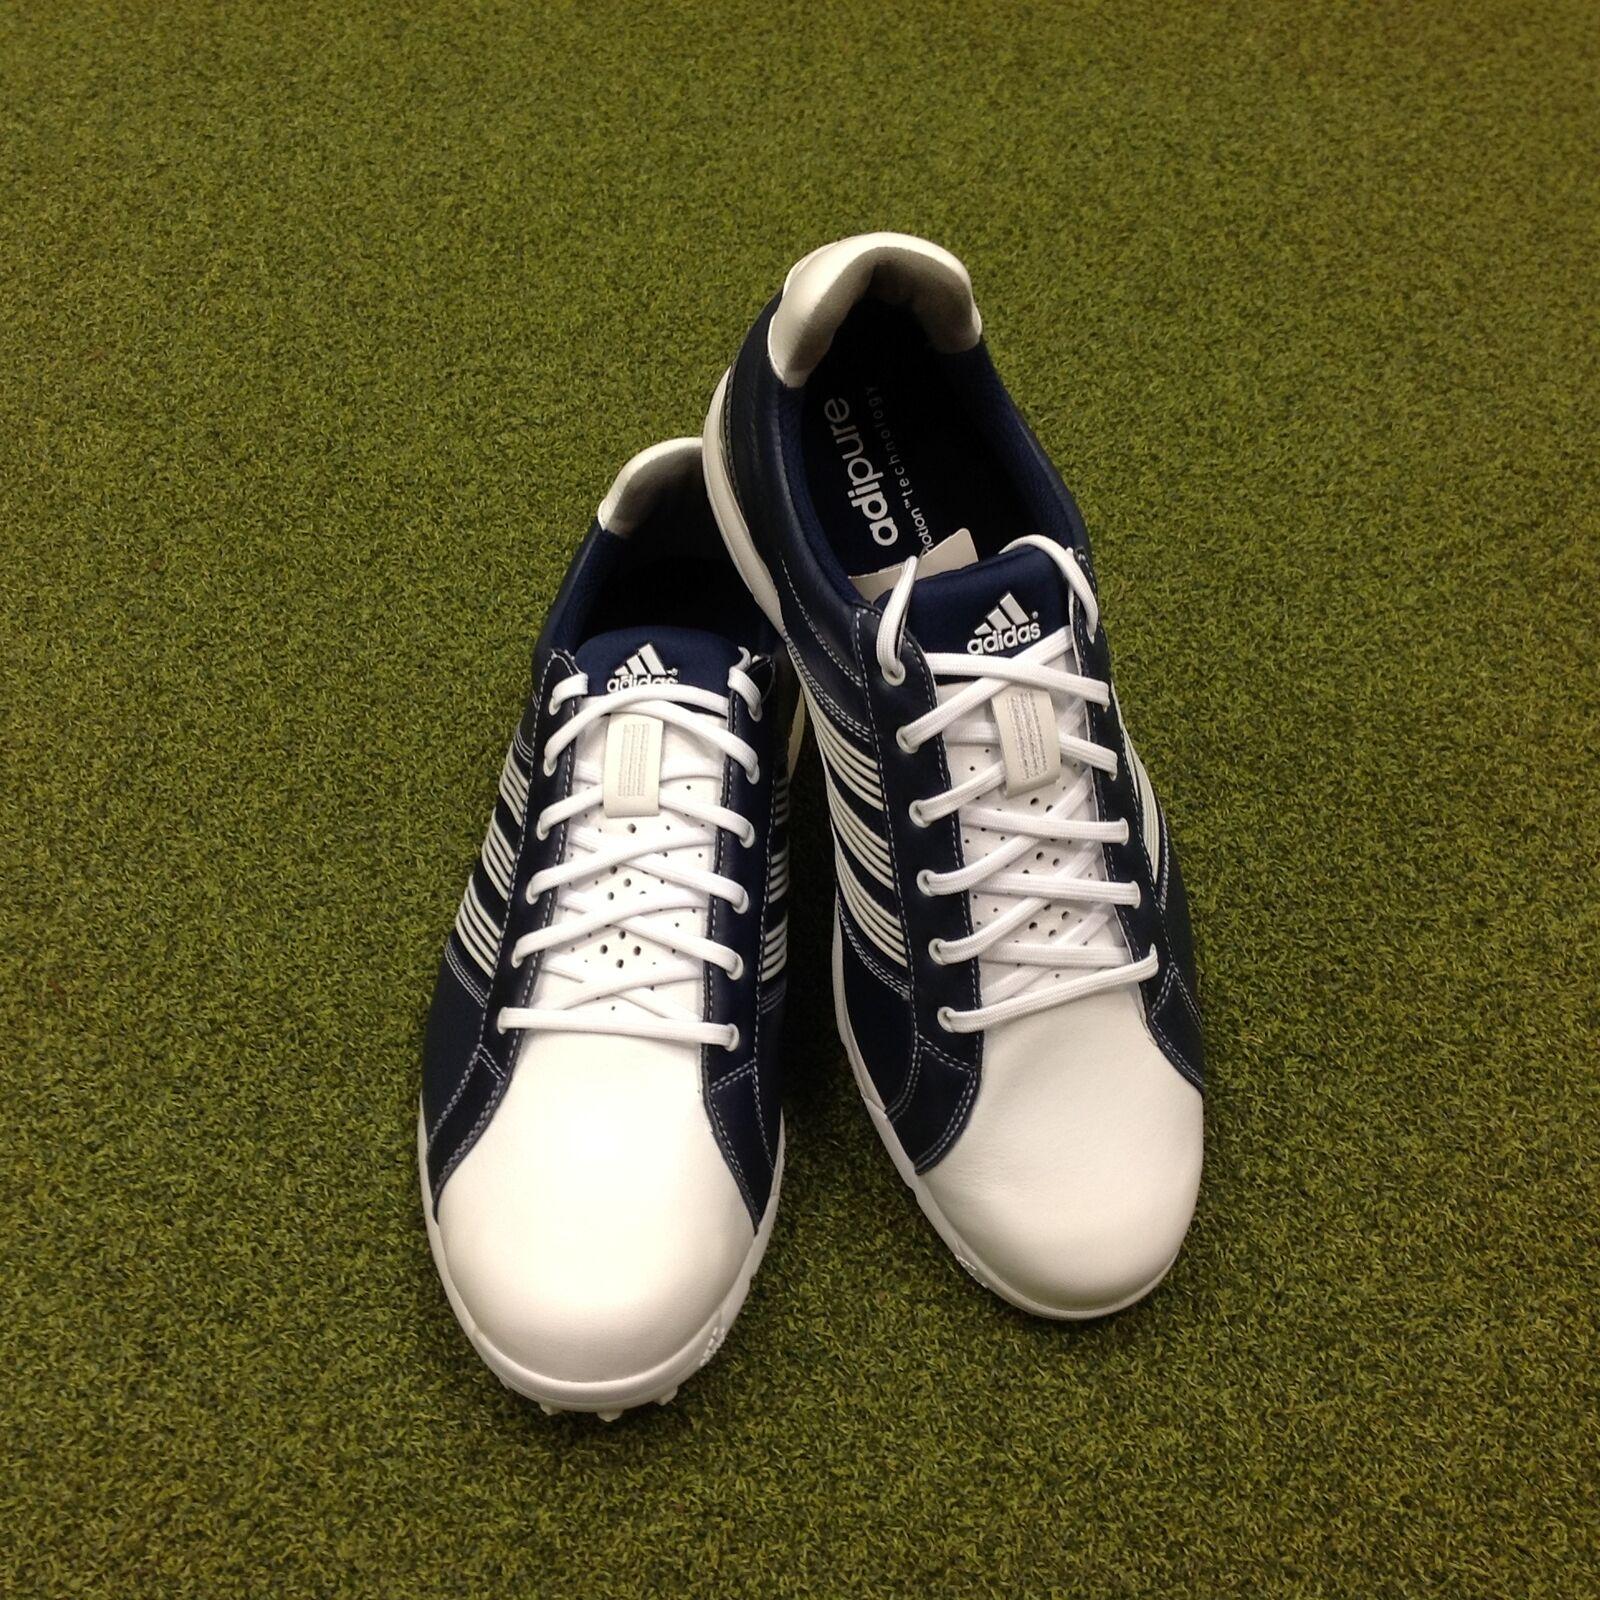 NEW Adidas Adicross Tour Leder Golf Schuhes - UK 9 Größe 8.5 - US 9 UK - EU 42 2/3 c26823